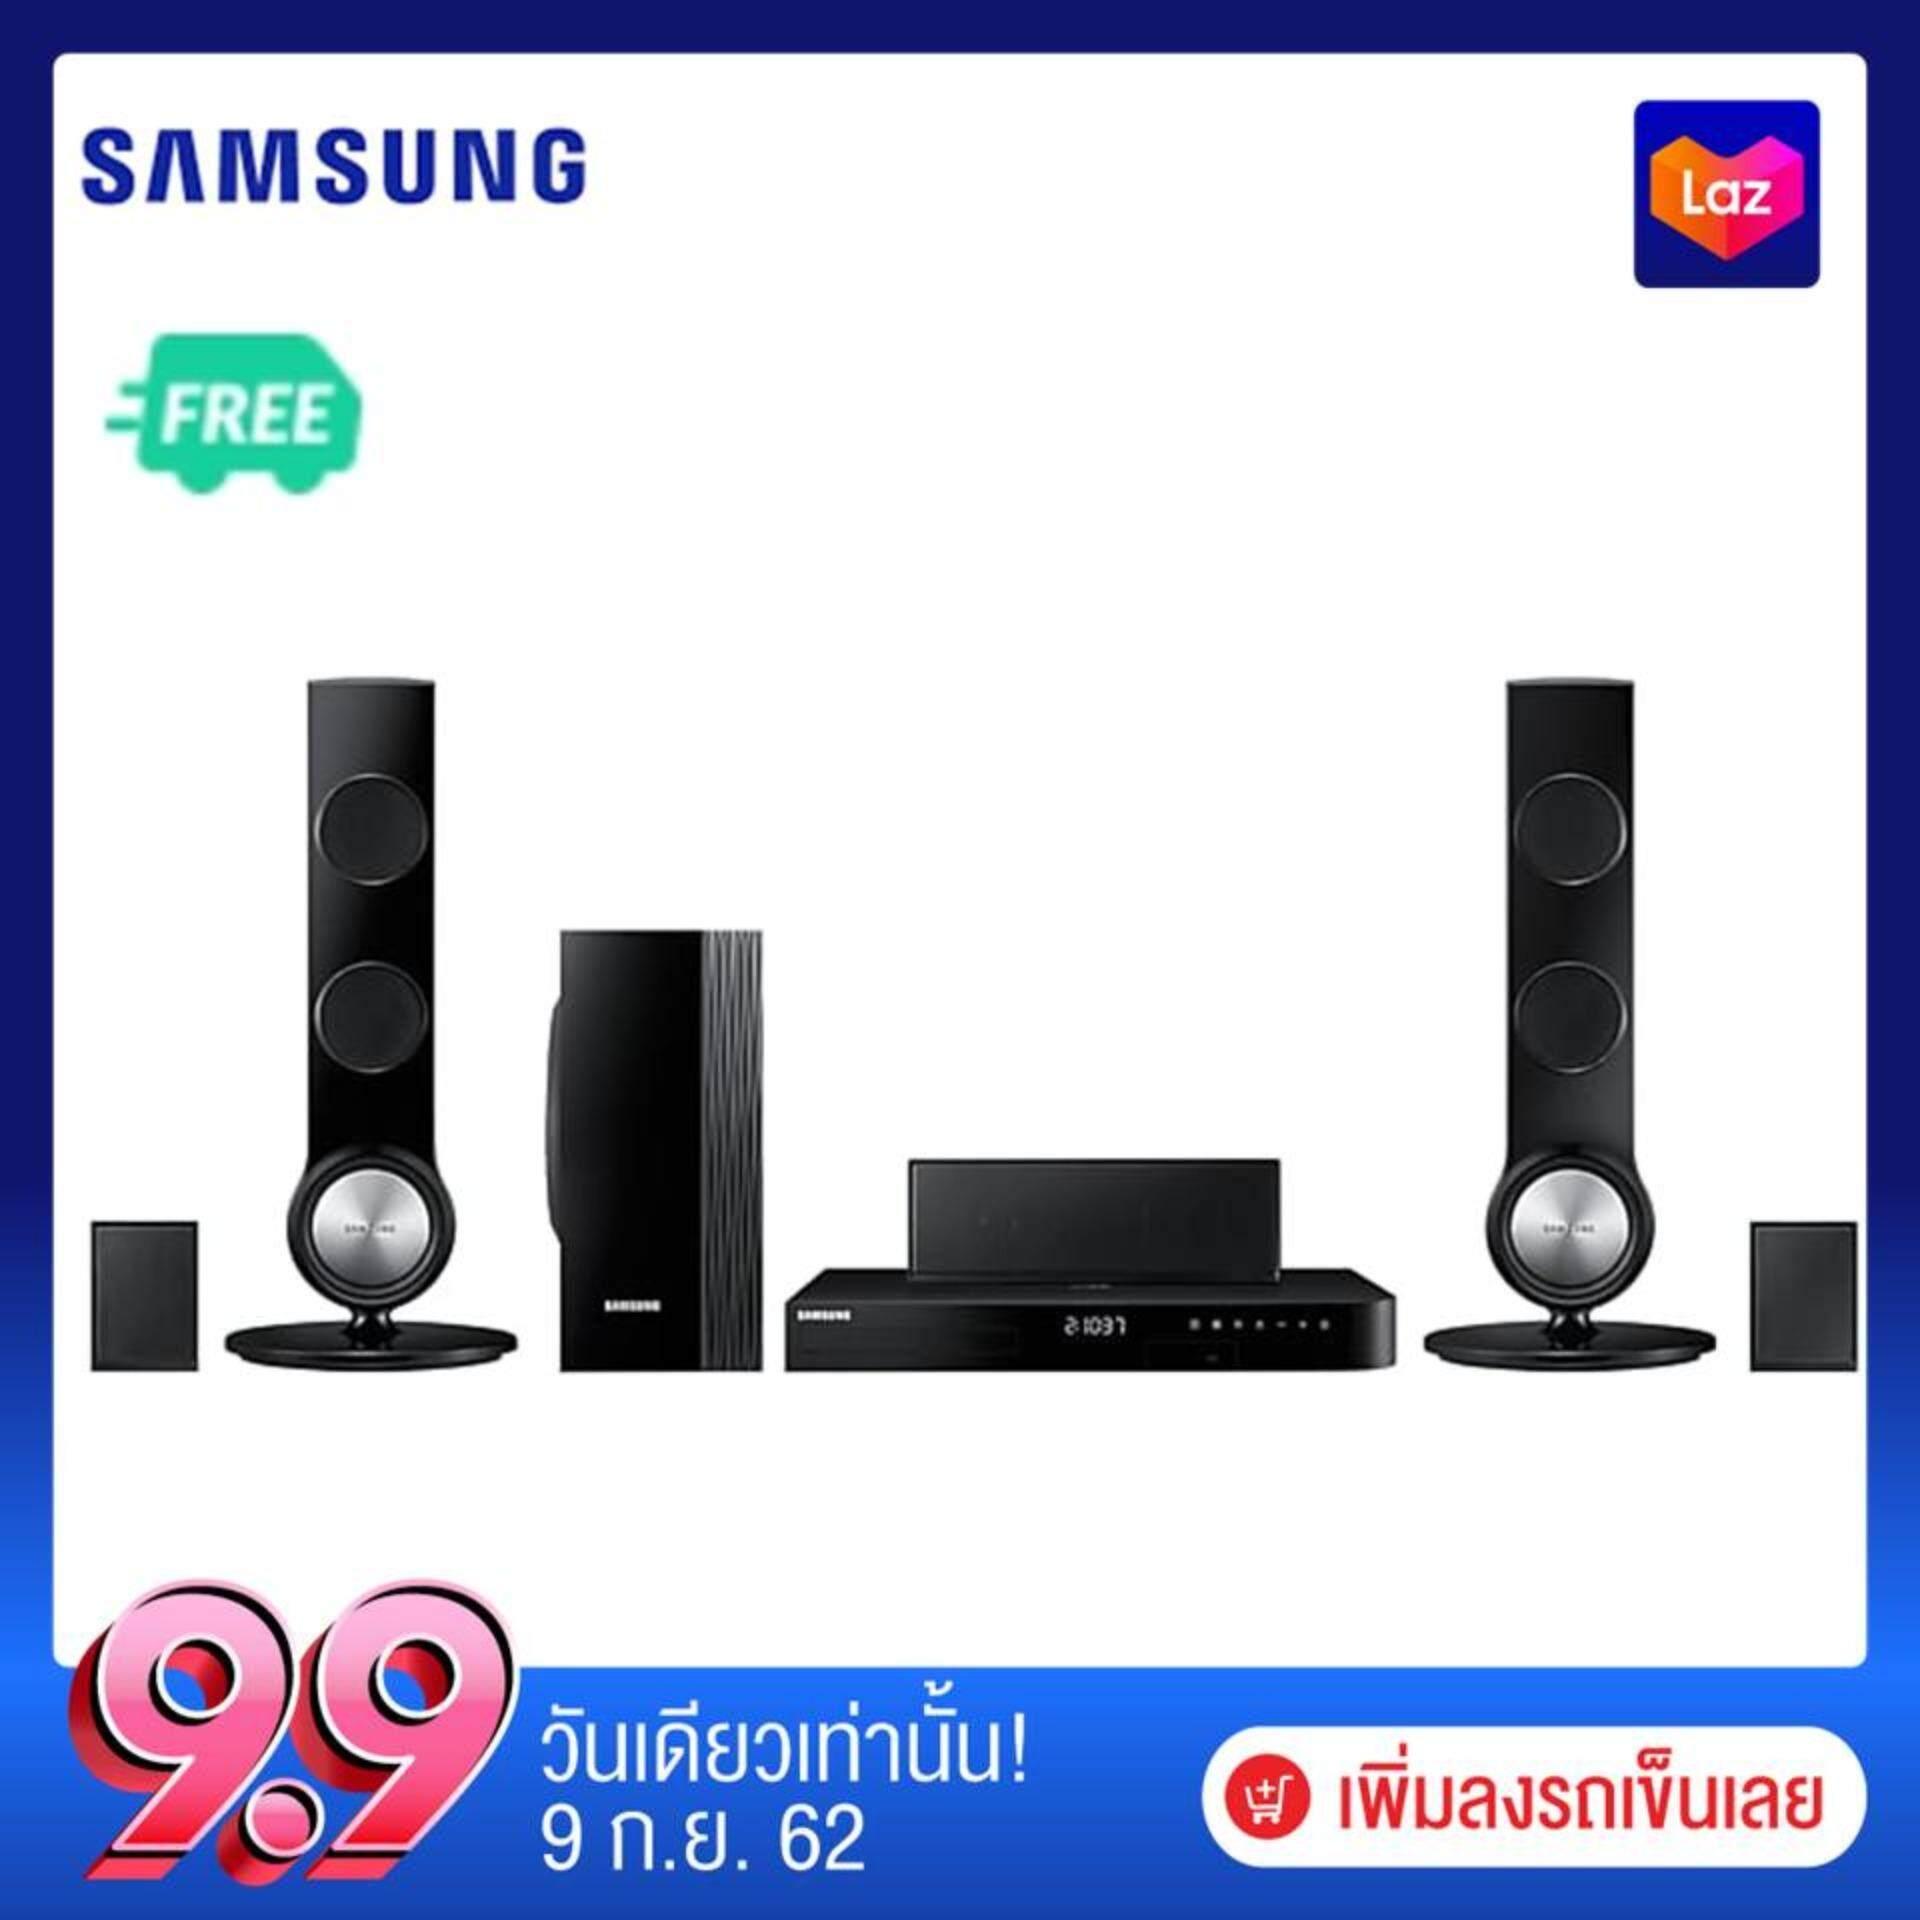 Samsung Blu-Ray Home Theater 1000w 5.1ch สีดำ รุ่น Ht-J5130hk/xt.